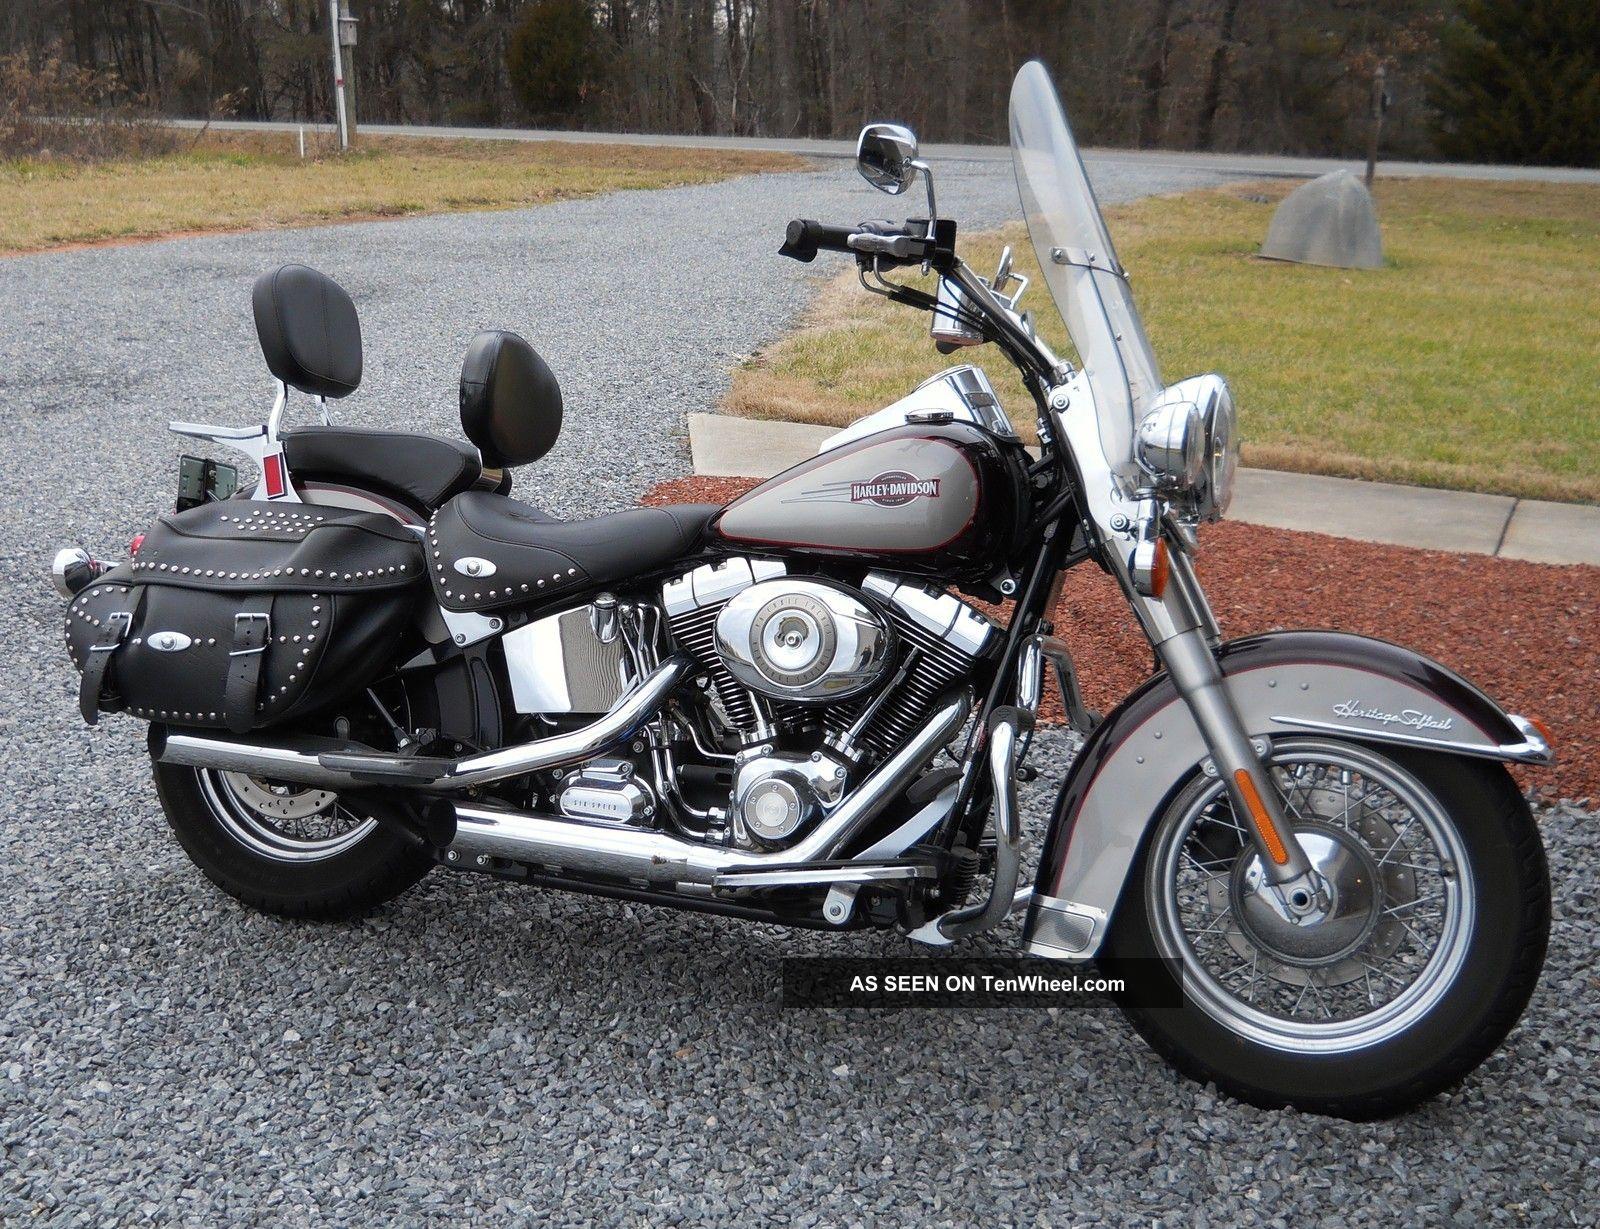 2007 harley davidson motorcycle heritage softail classic cruiser flstc euc. Black Bedroom Furniture Sets. Home Design Ideas